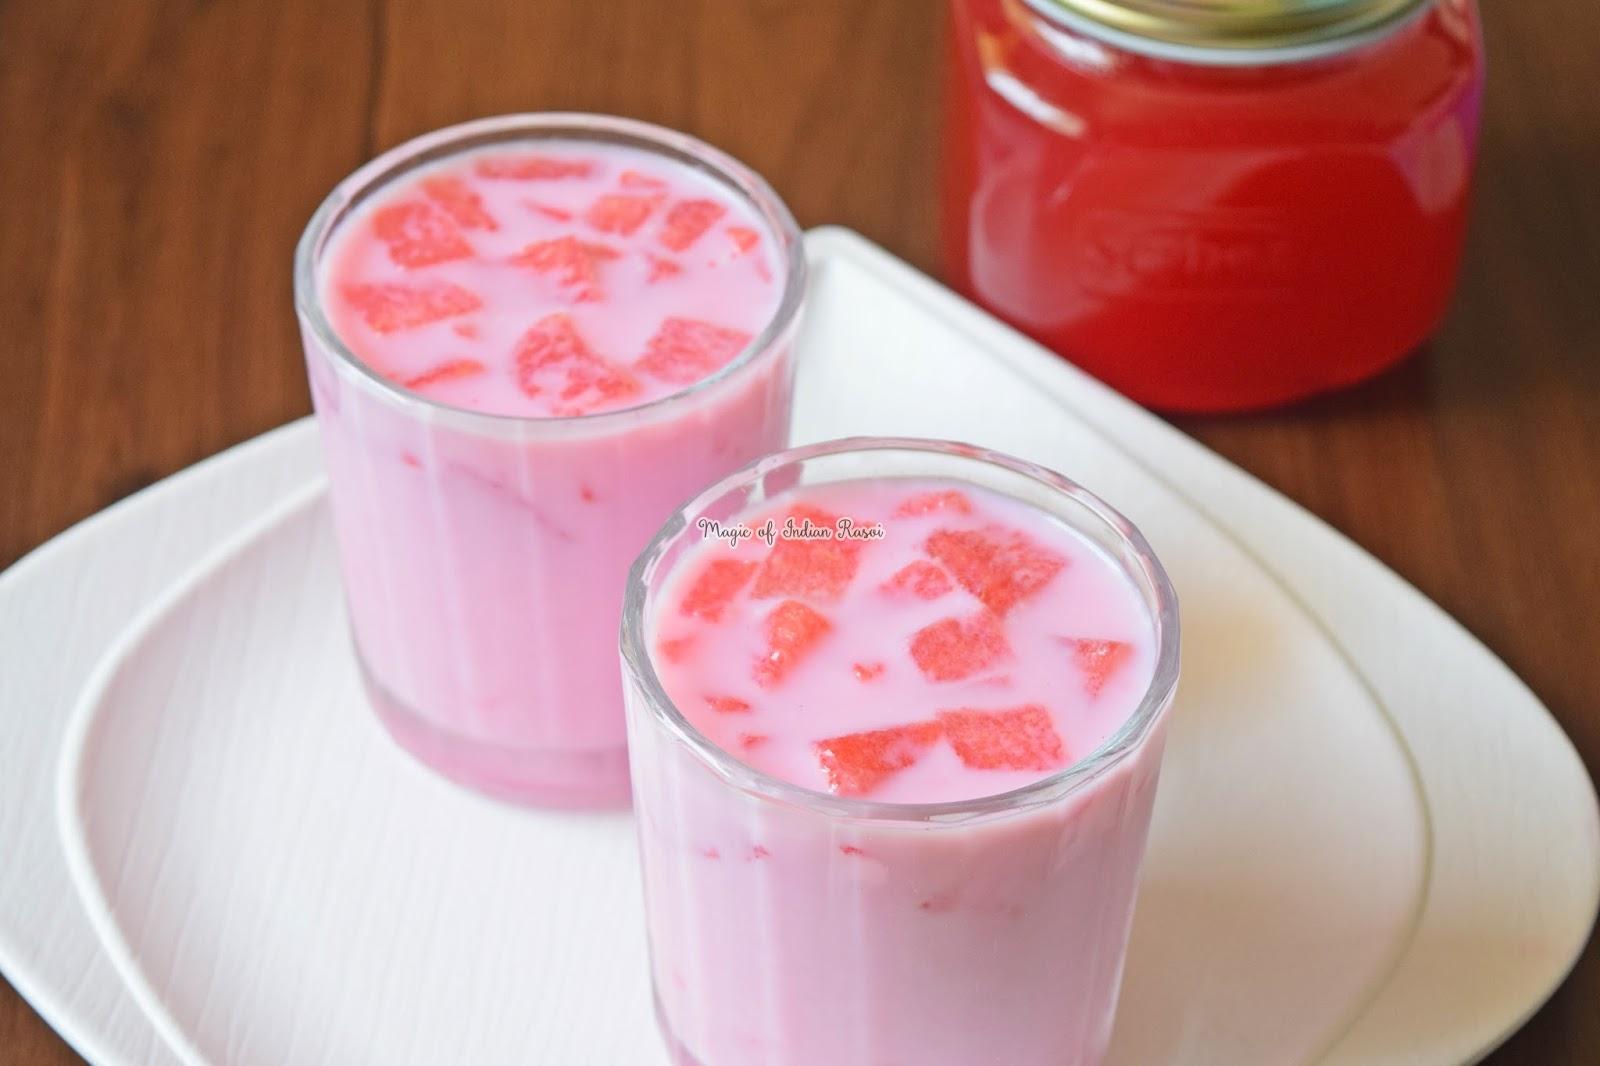 Fresh Rose Petals Syrup Recipe - Rose Milk Sharbat - फ्रेश रोज पेटल सिरप रेसिपी - रोज मिल्क शरबत - Priya R - Magic of Indian Rasoi